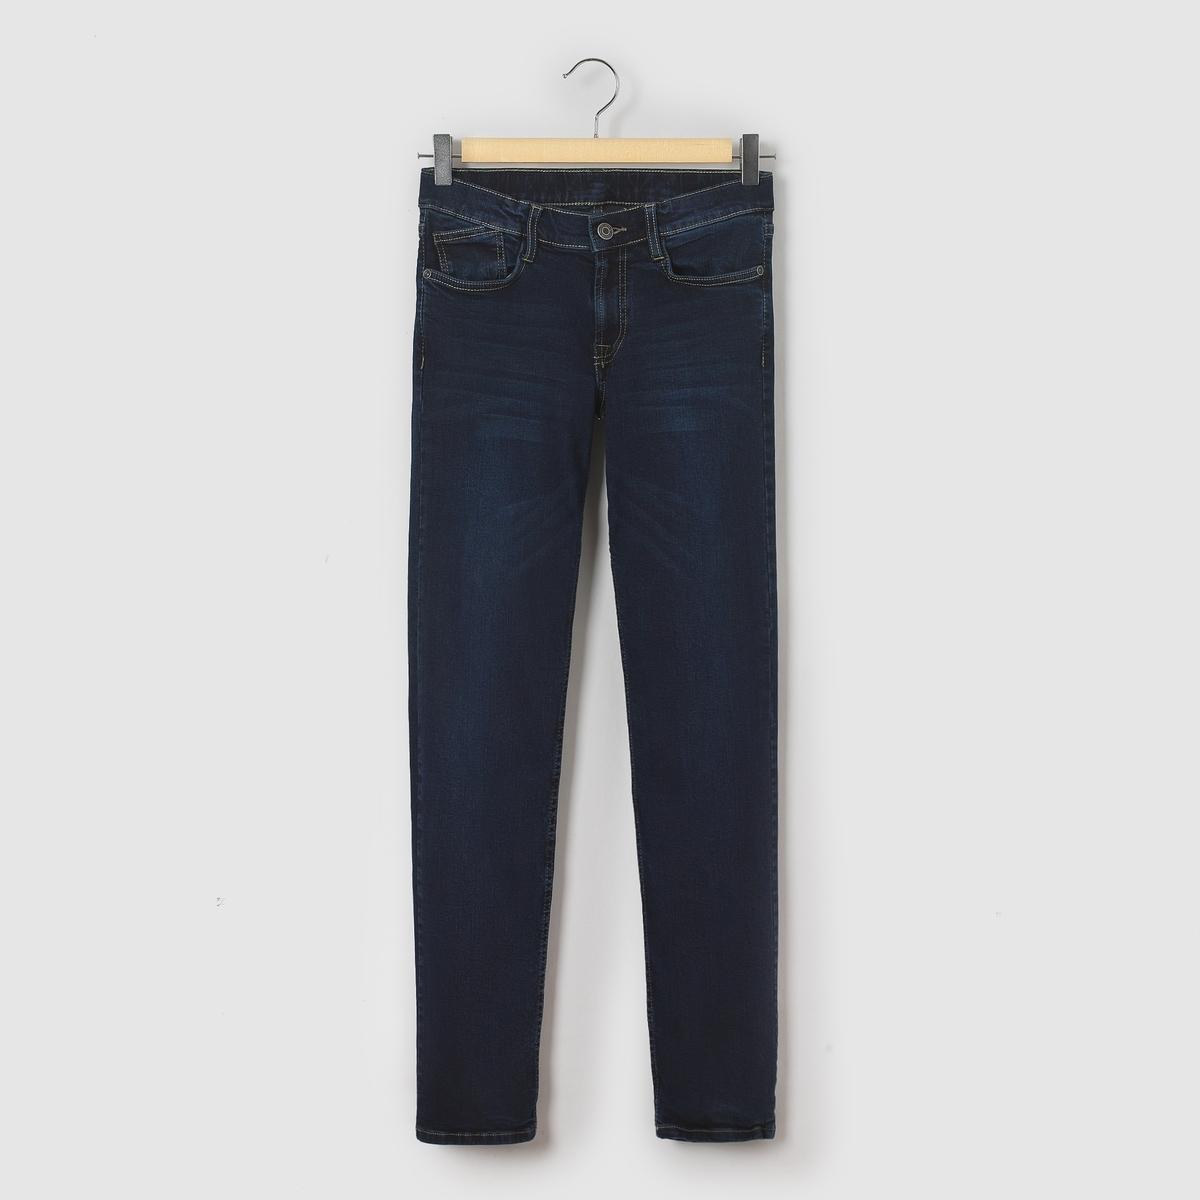 Jeans azul brut 10 - 16 anos